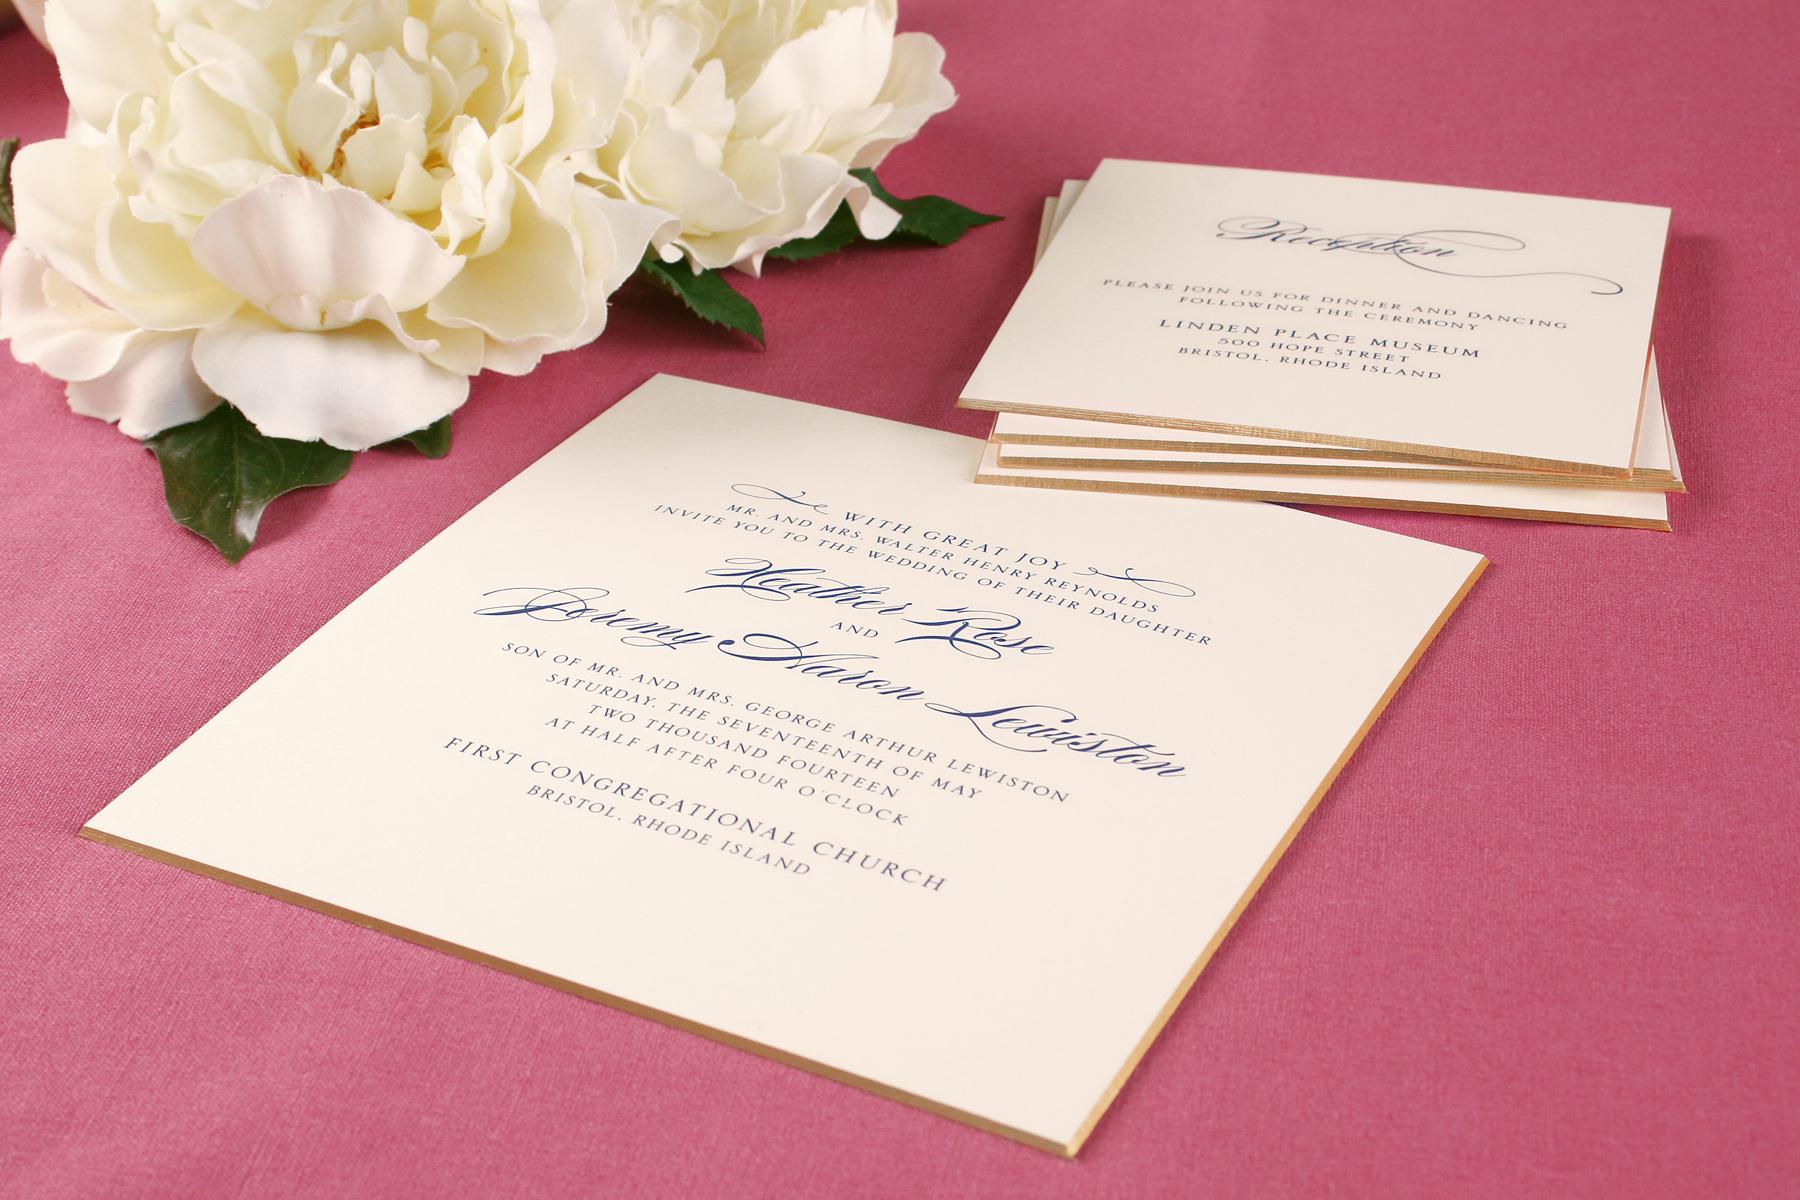 Wedding Invitations William Arthur: William Arthur Invitation Sale